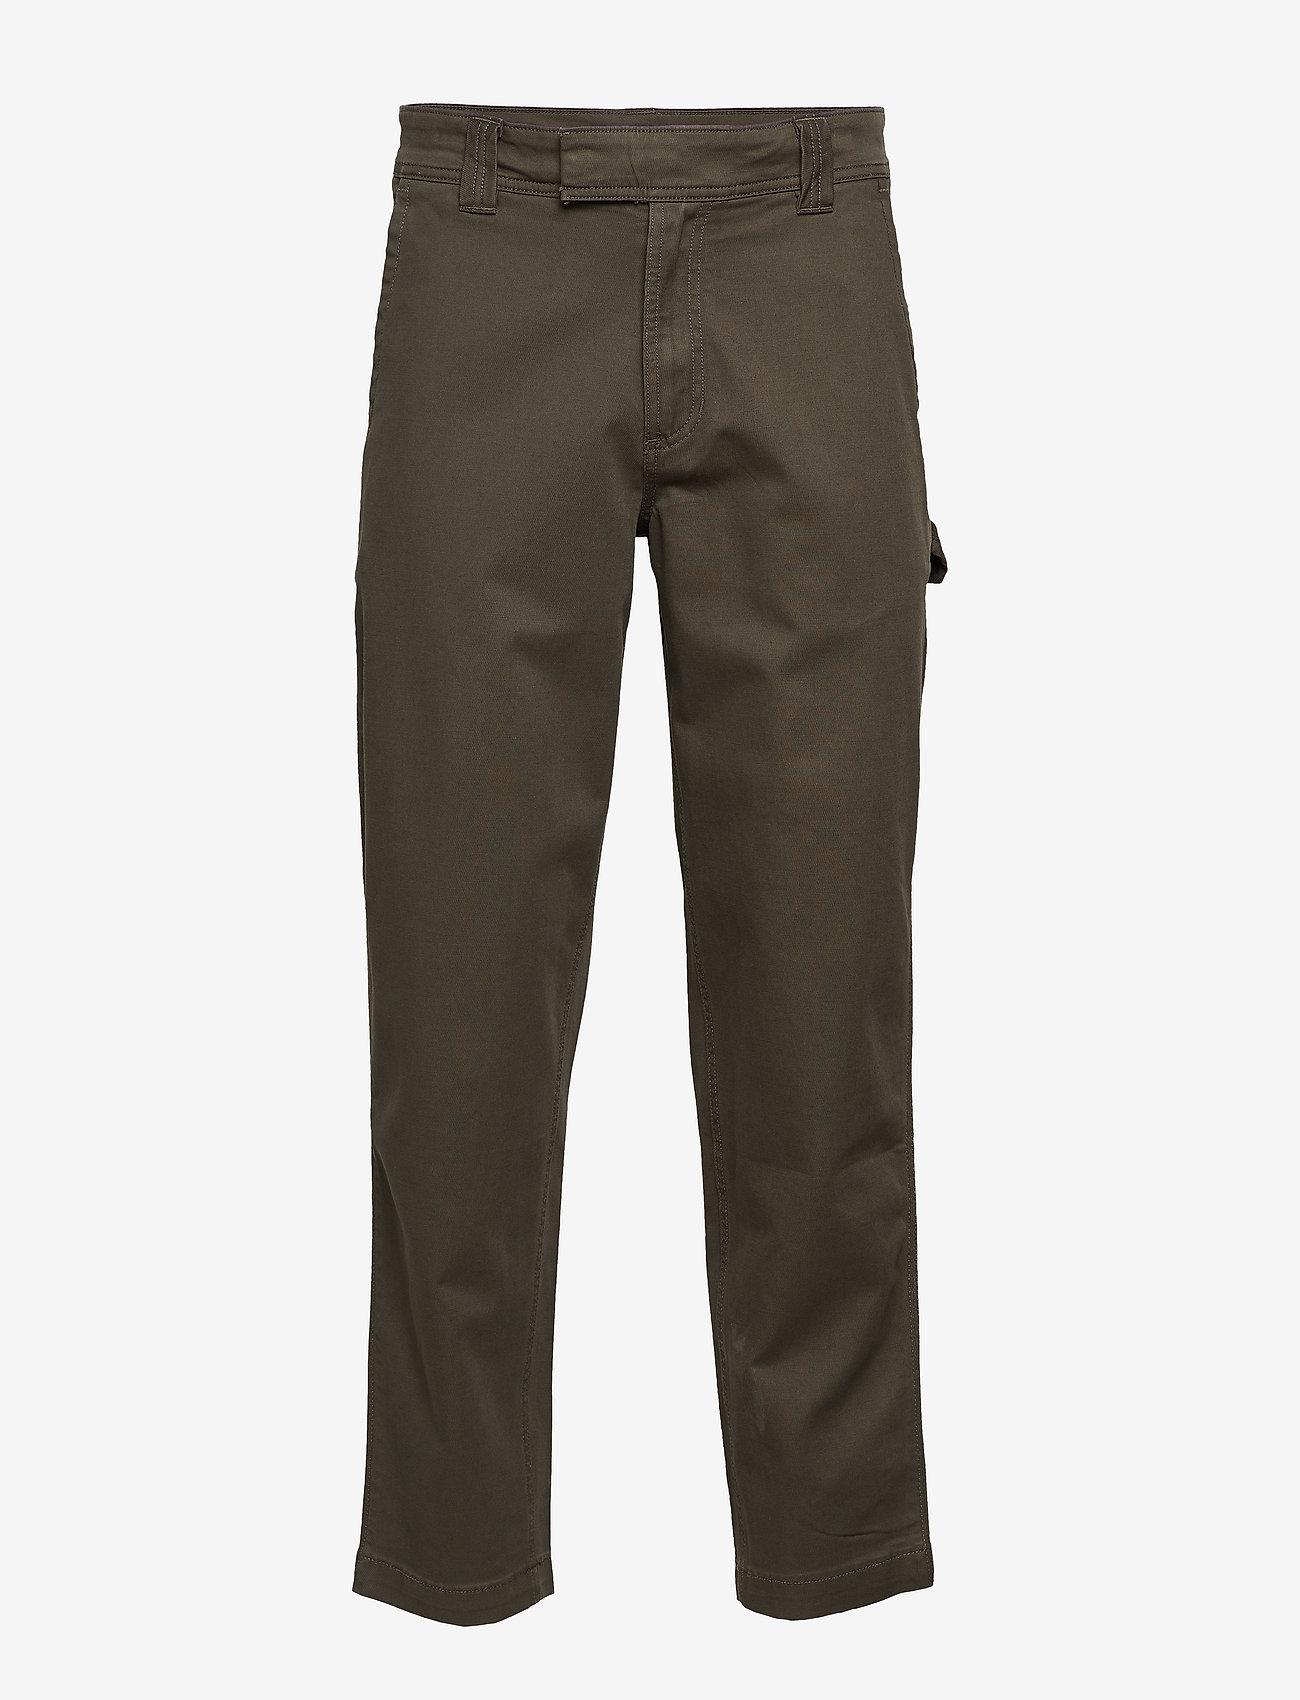 Calvin Klein Jeans - 056 GINOK UTILITY PANT - bojówki - grape leaf - 0